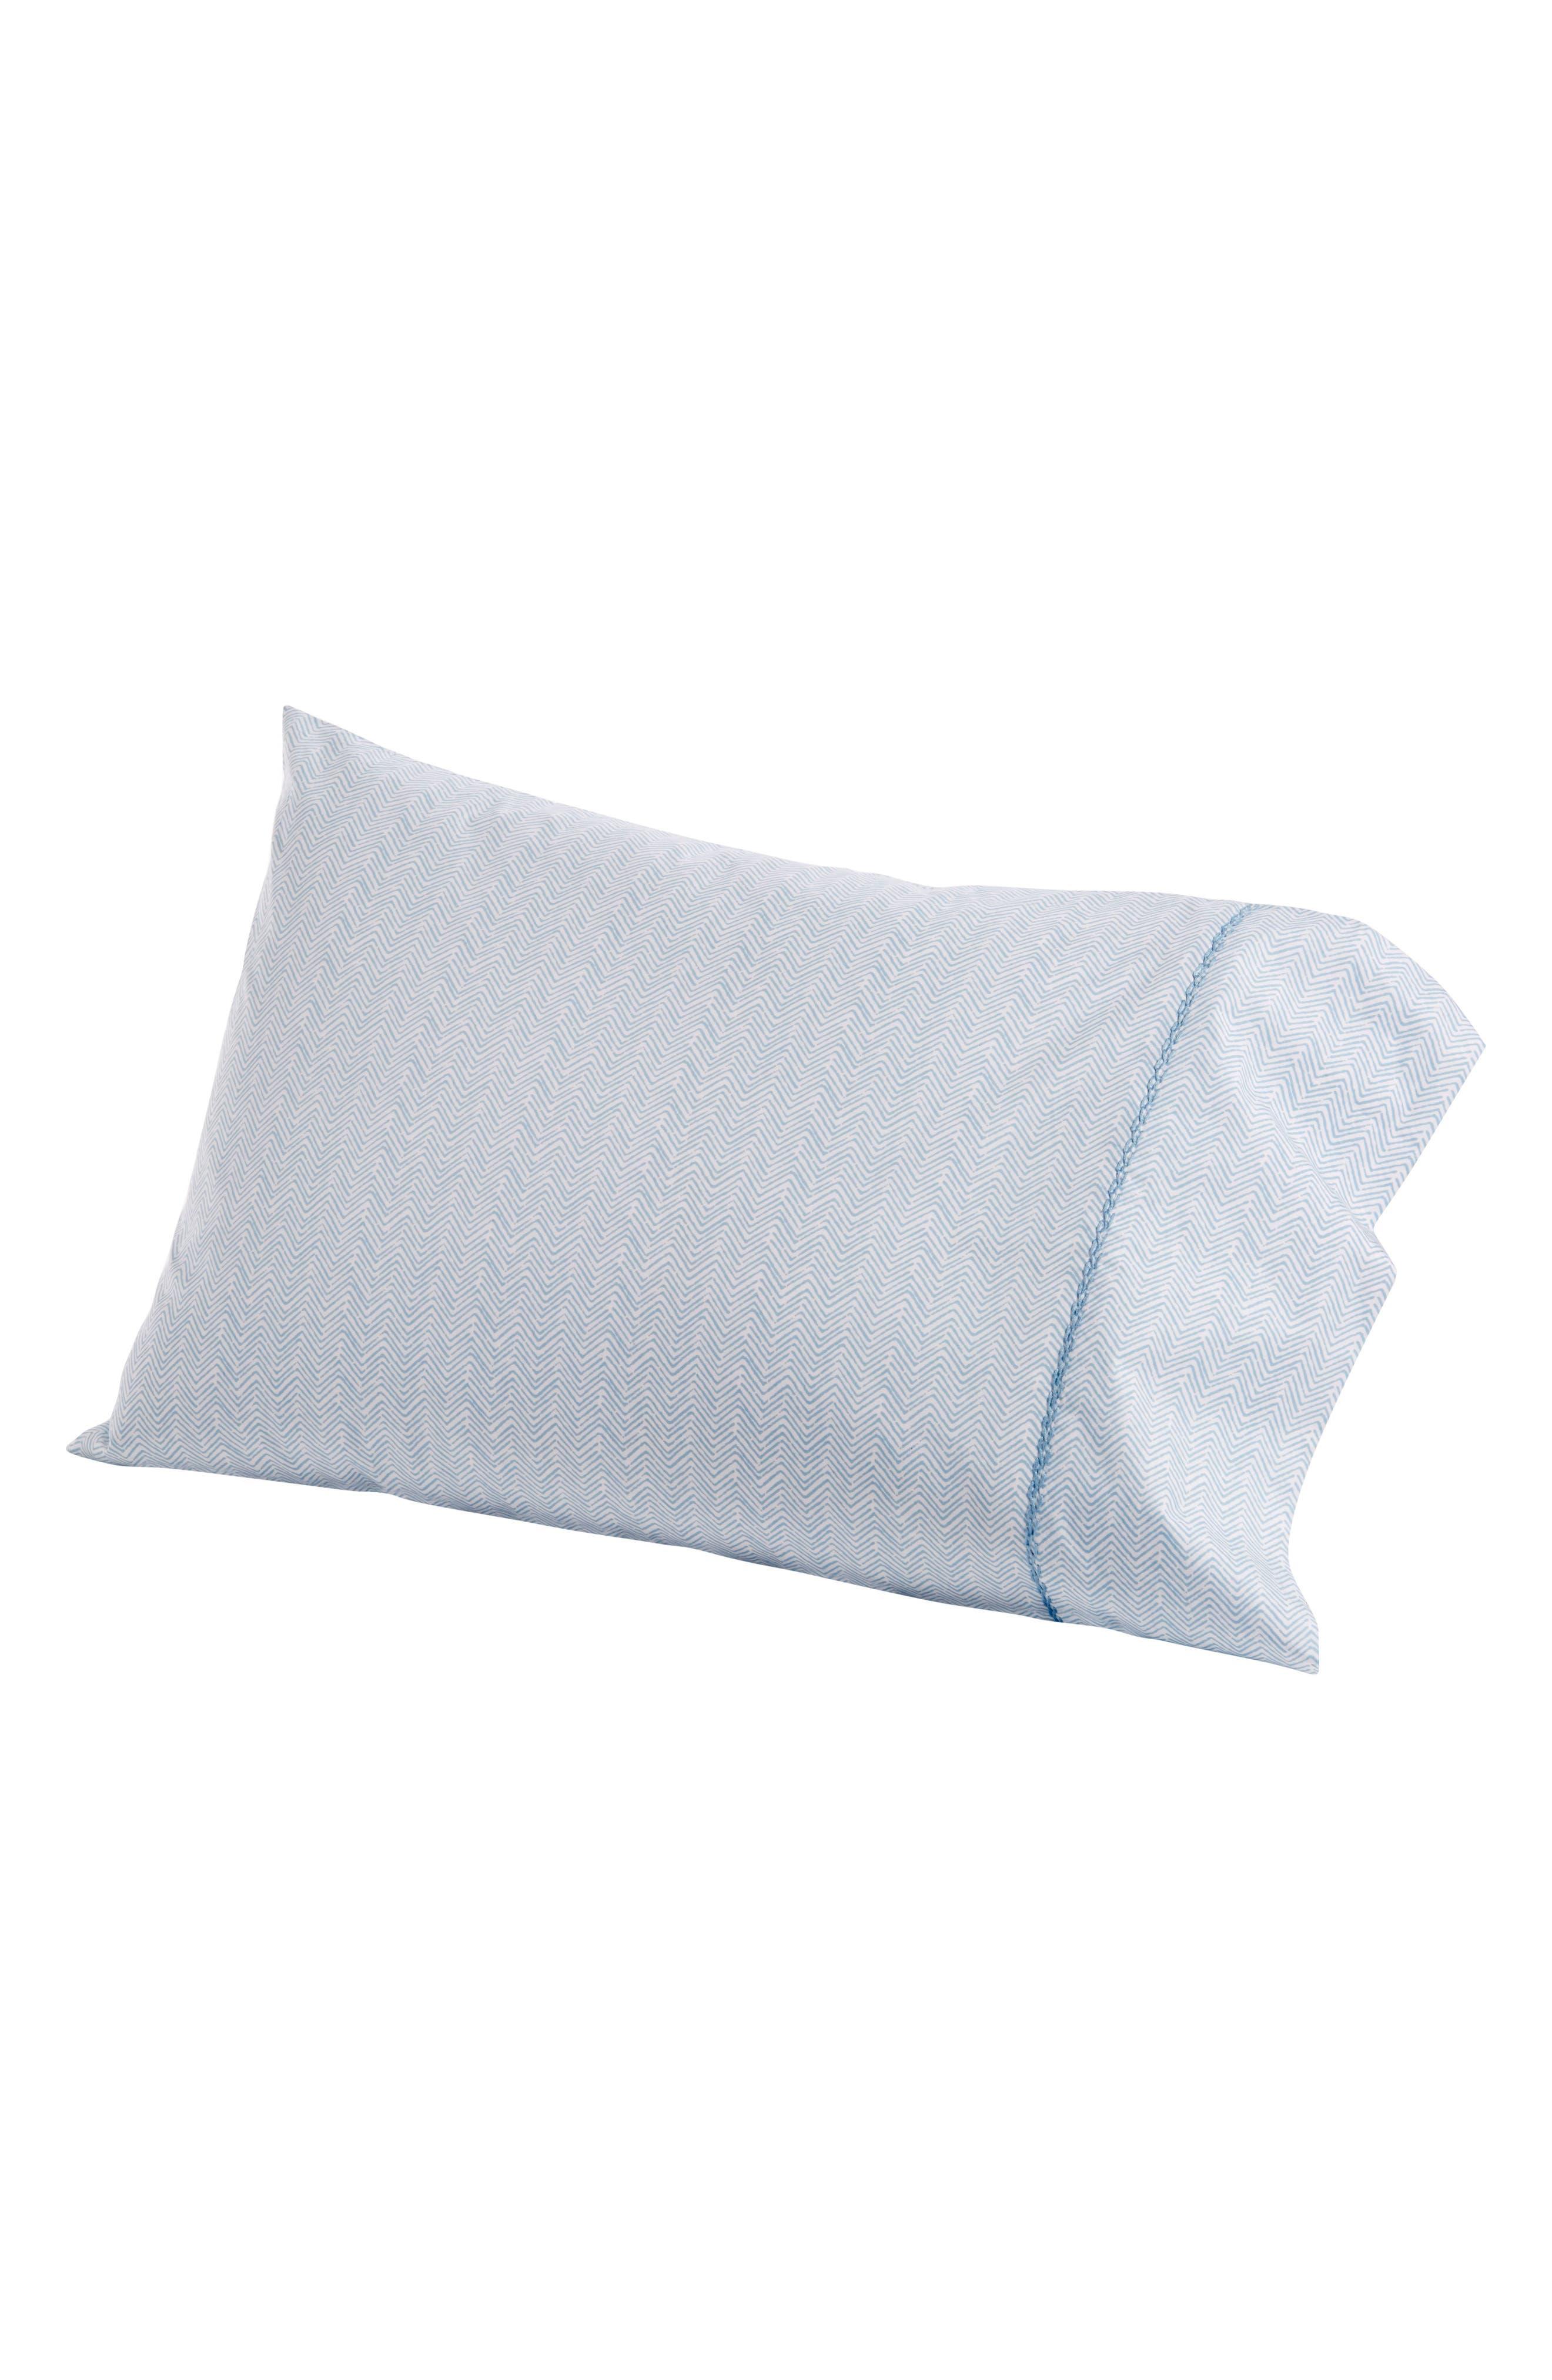 Chevron Combed Cotton Pillowcases,                         Main,                         color, Light Indigo White